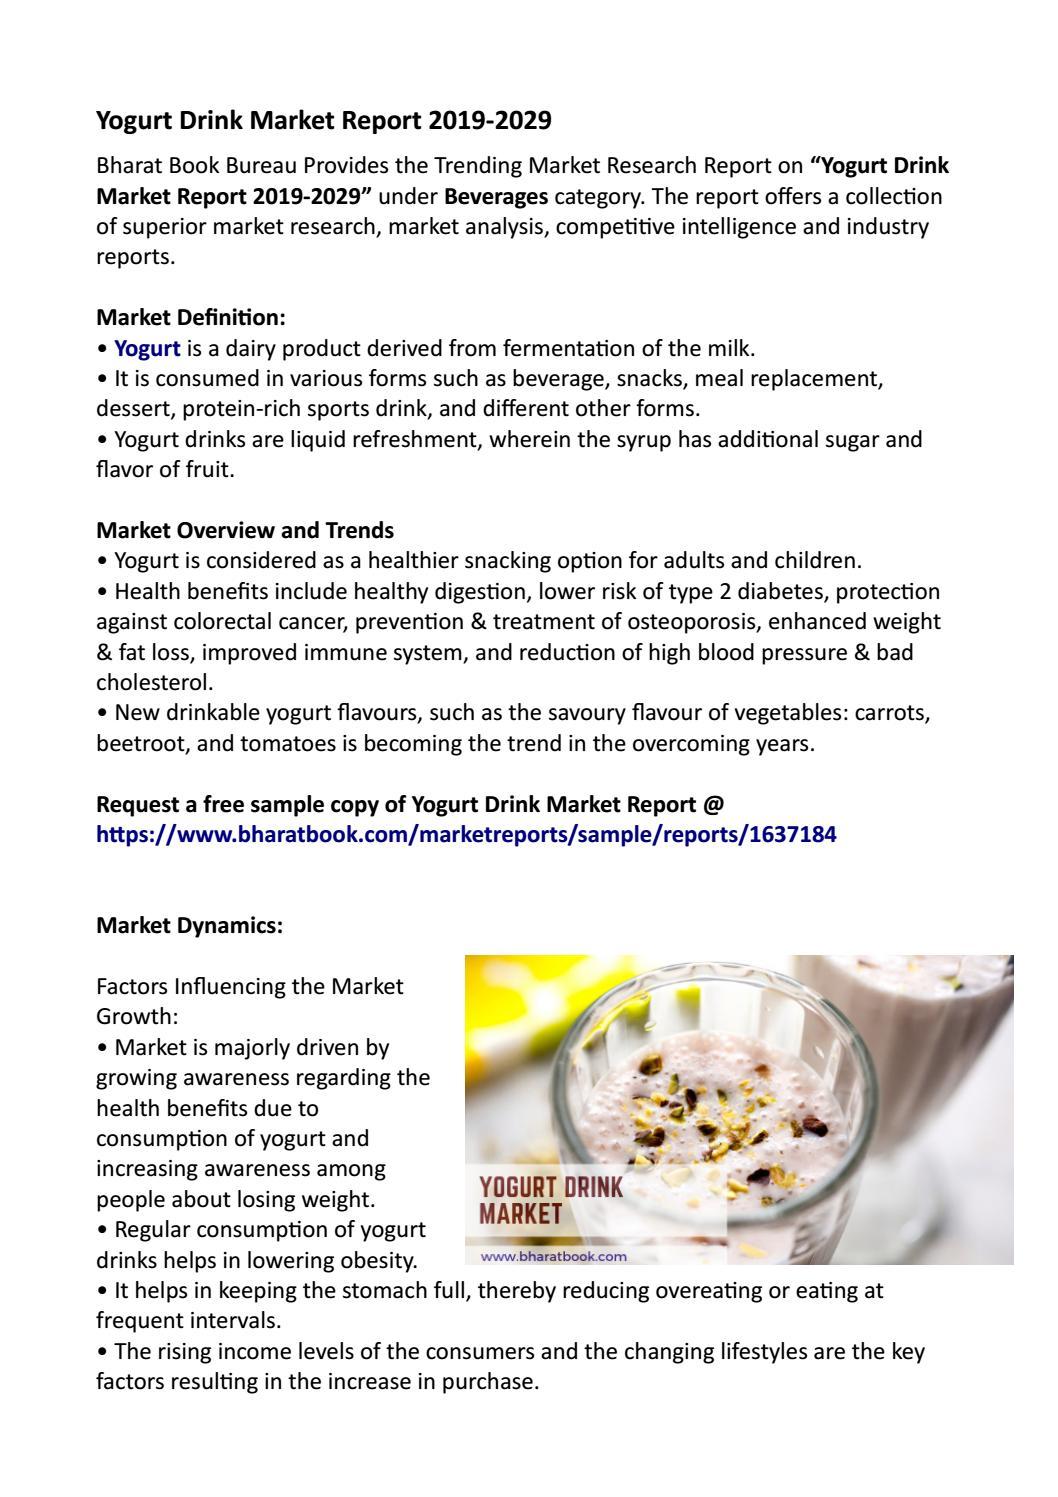 Yogurt Drink Market Research Report 2019-2029 by Bharat Book